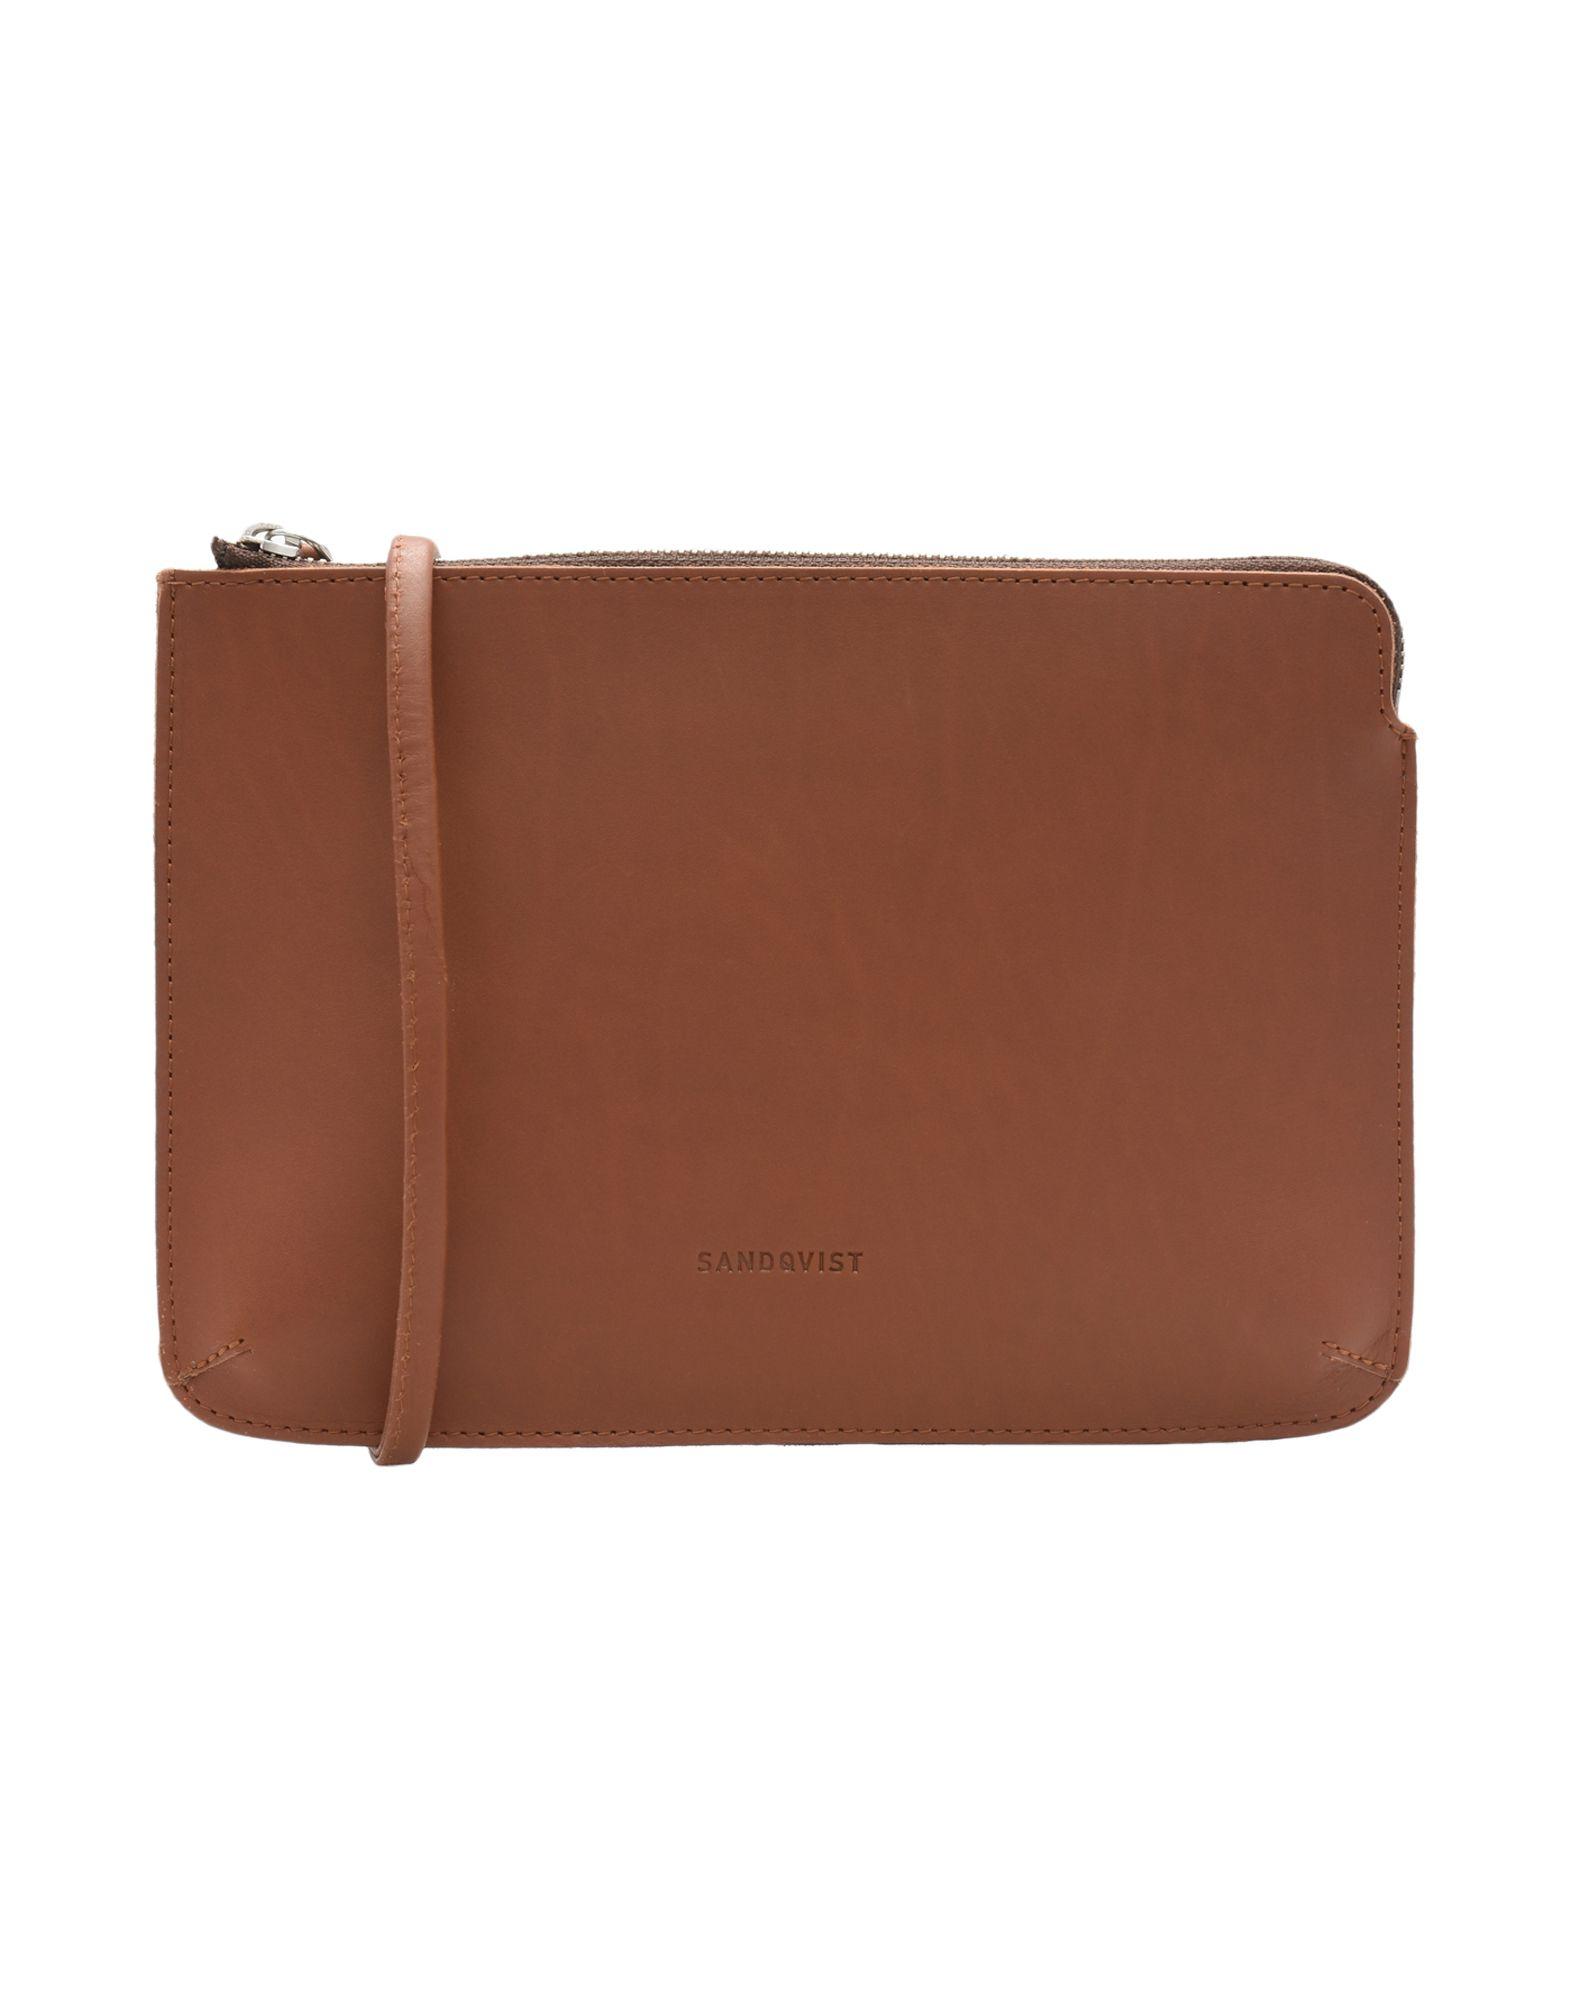 SANDQVIST Across-Body Bag in Brown